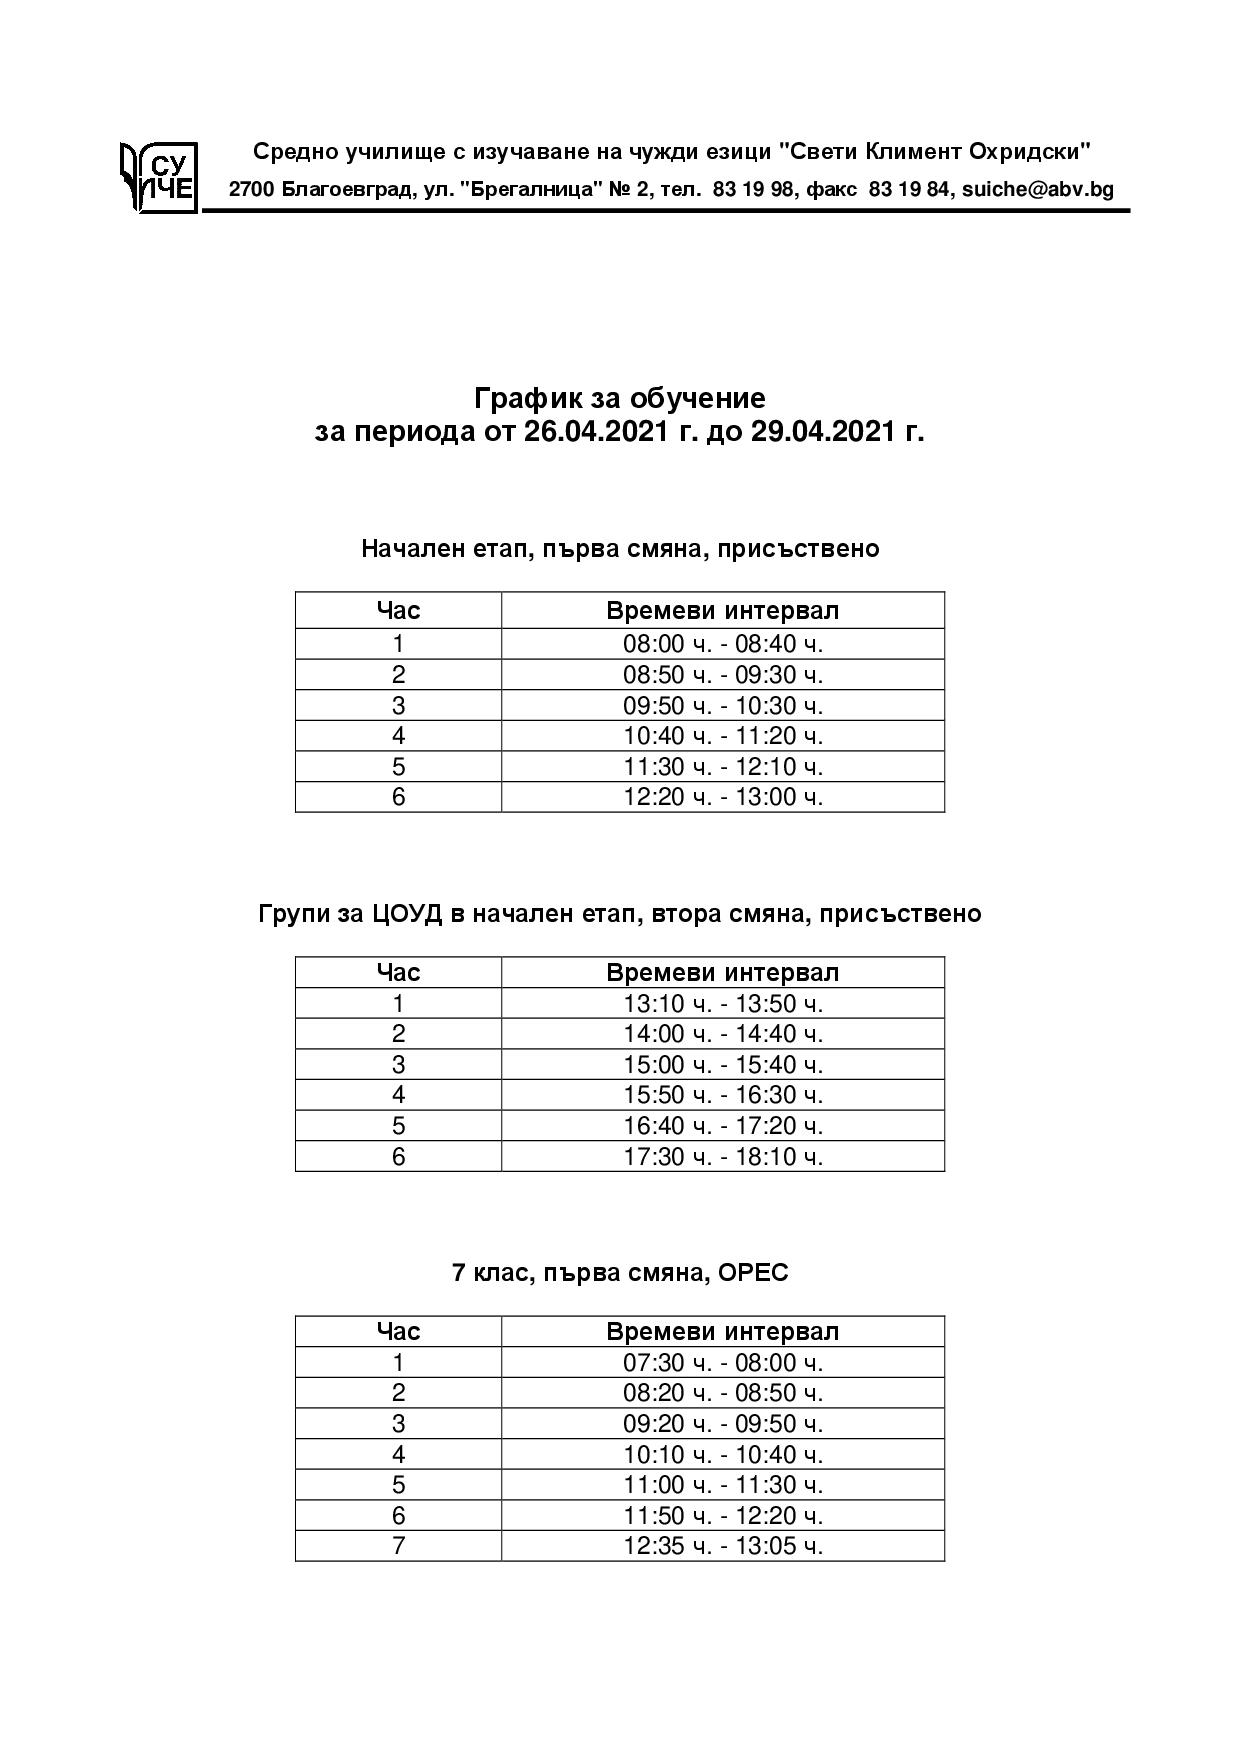 grafik26.04-29.04p1.png